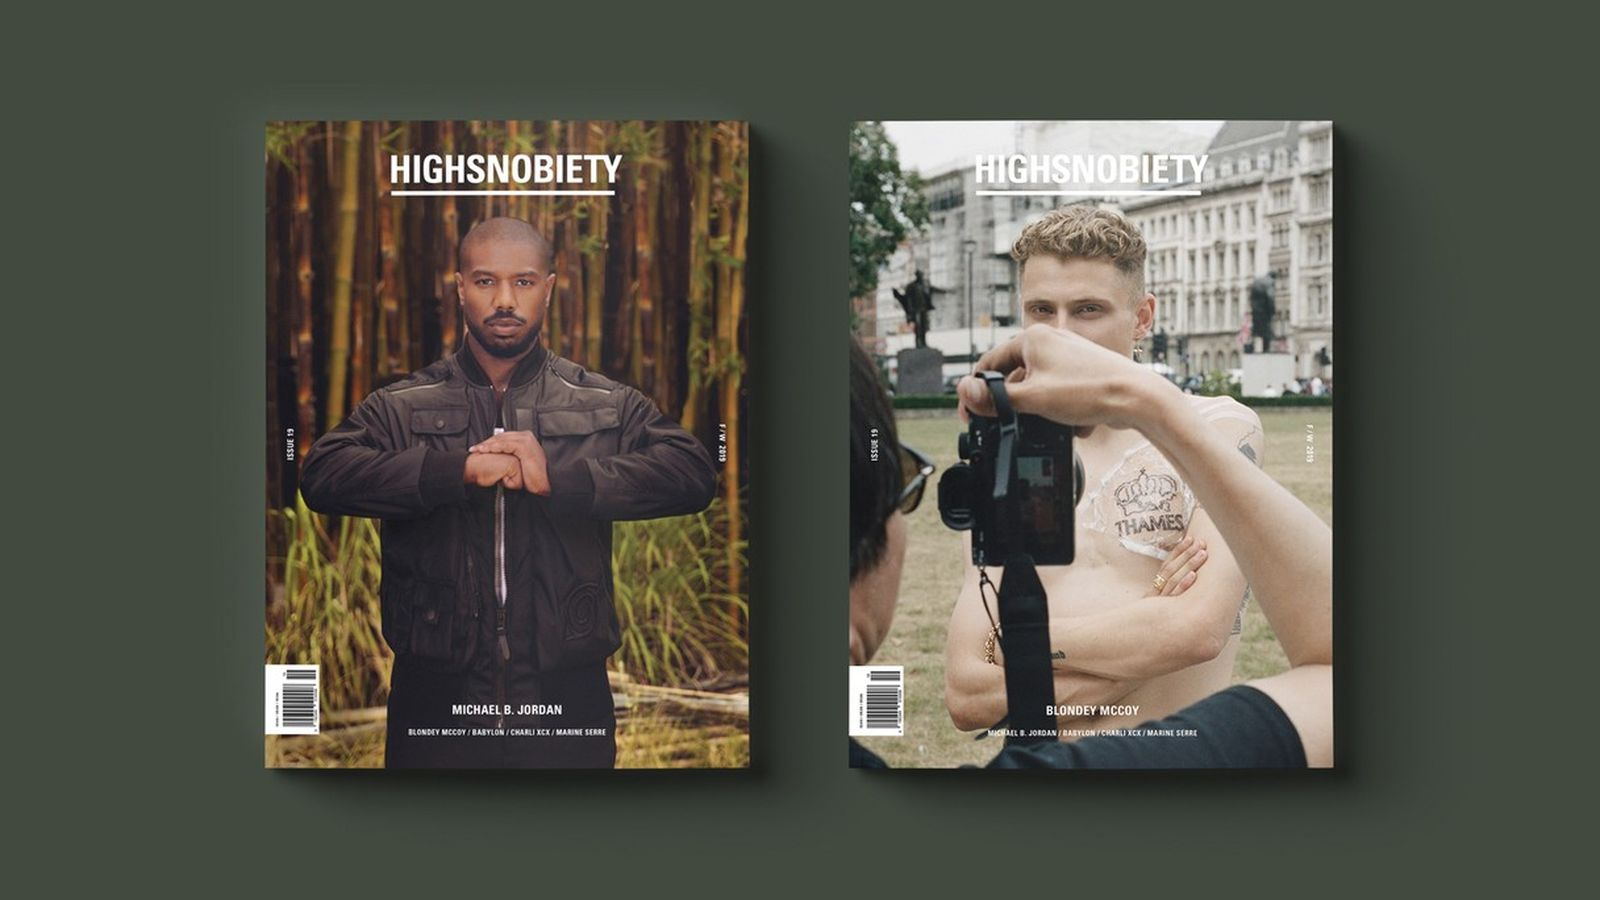 HIGHSNOBIETY MAGAZINE - ISSUE 19 - campaign